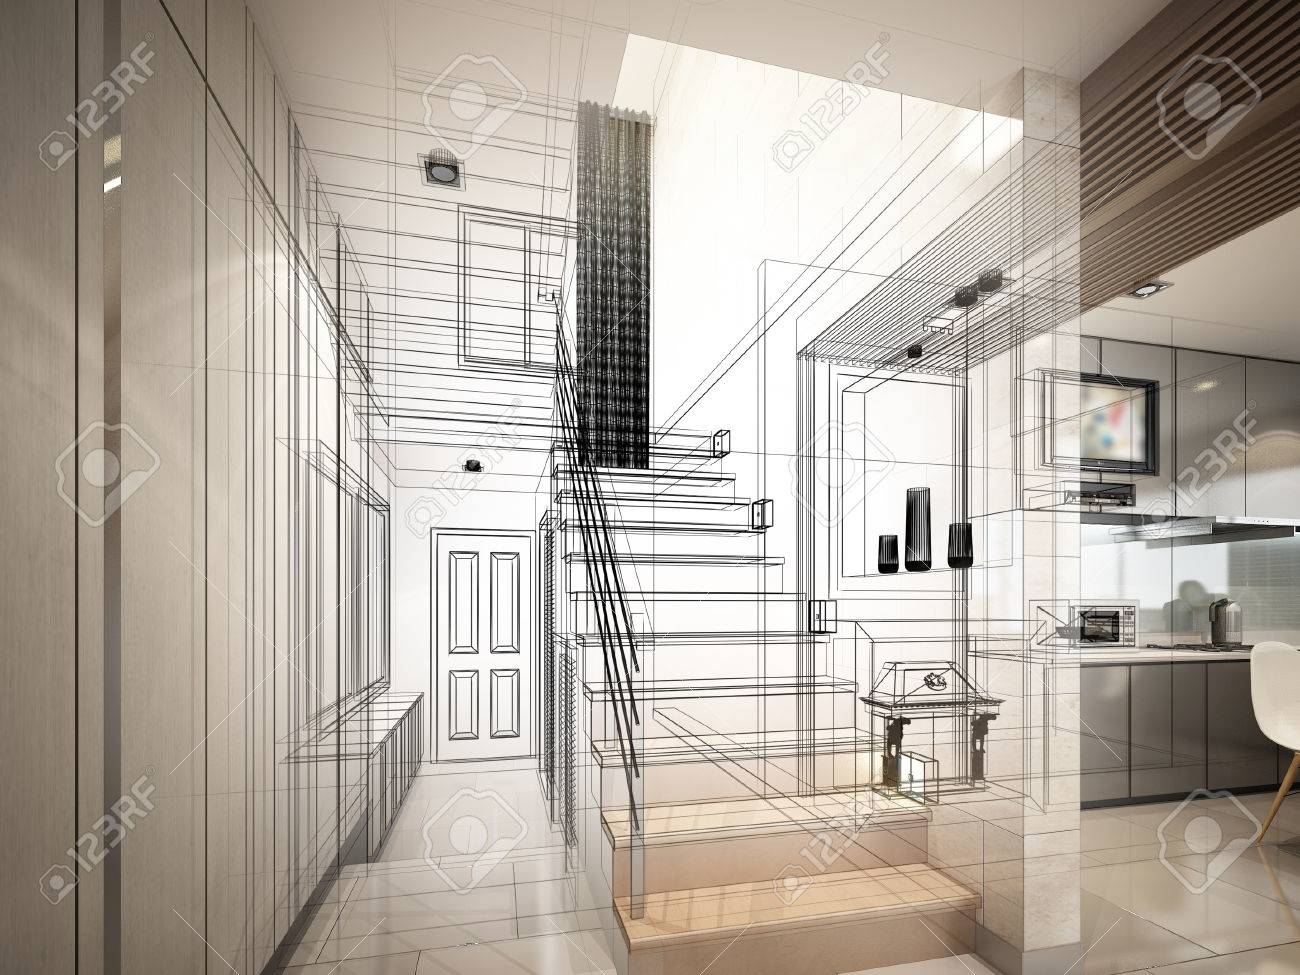 sketch design of stair hall 3dwire frame render - 40904843